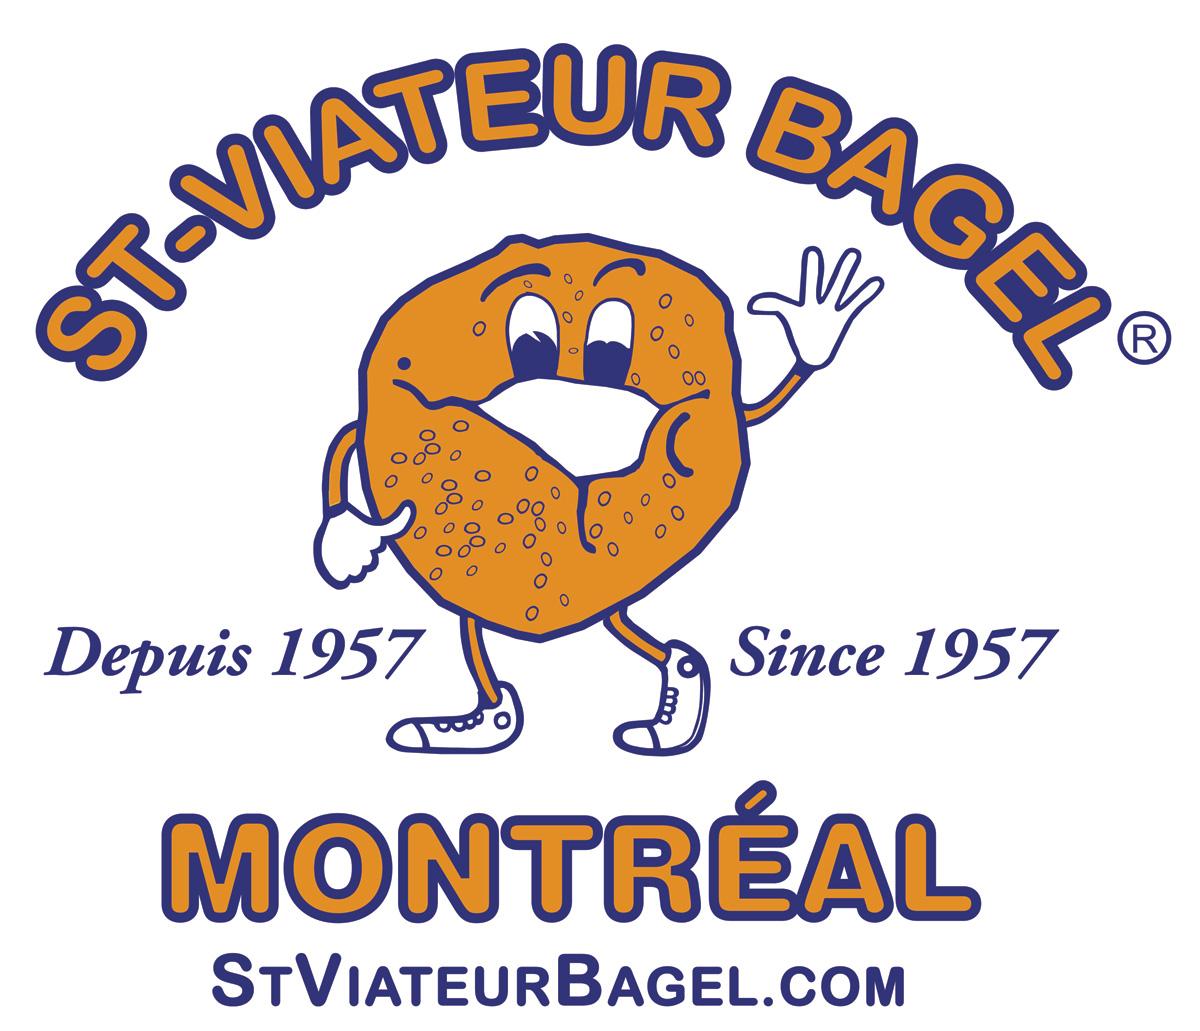 Logo_St_Viateur-Bagel_Color_low-res.jpg